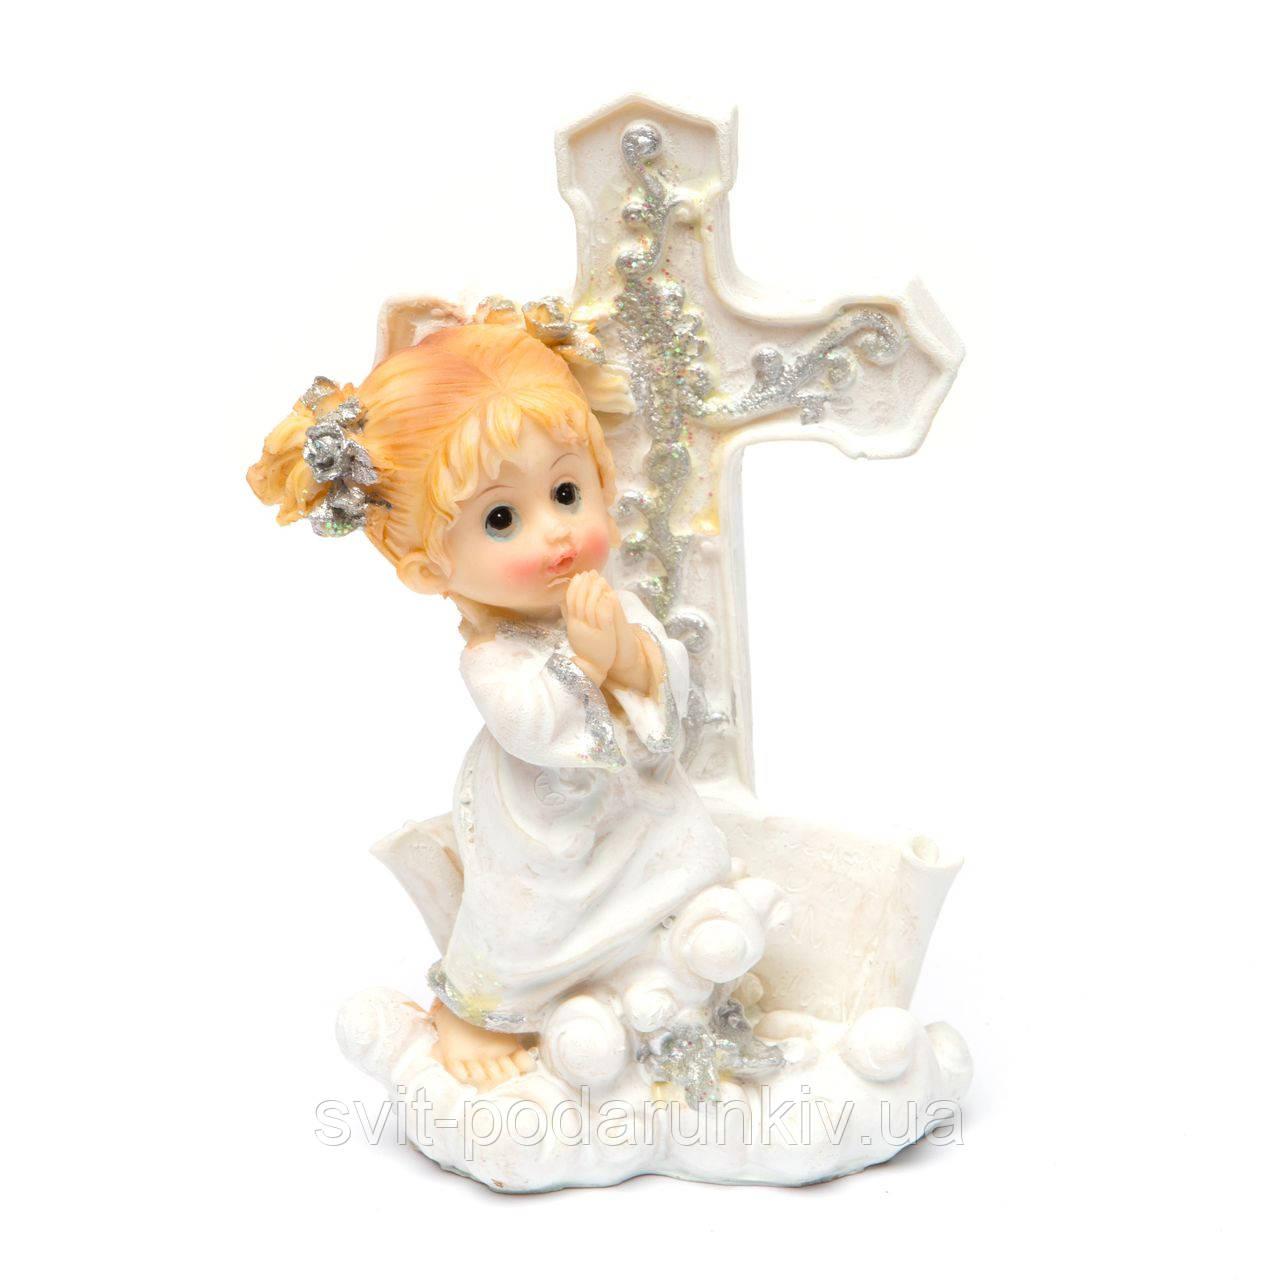 Статуэтка ангелочек 5016 C